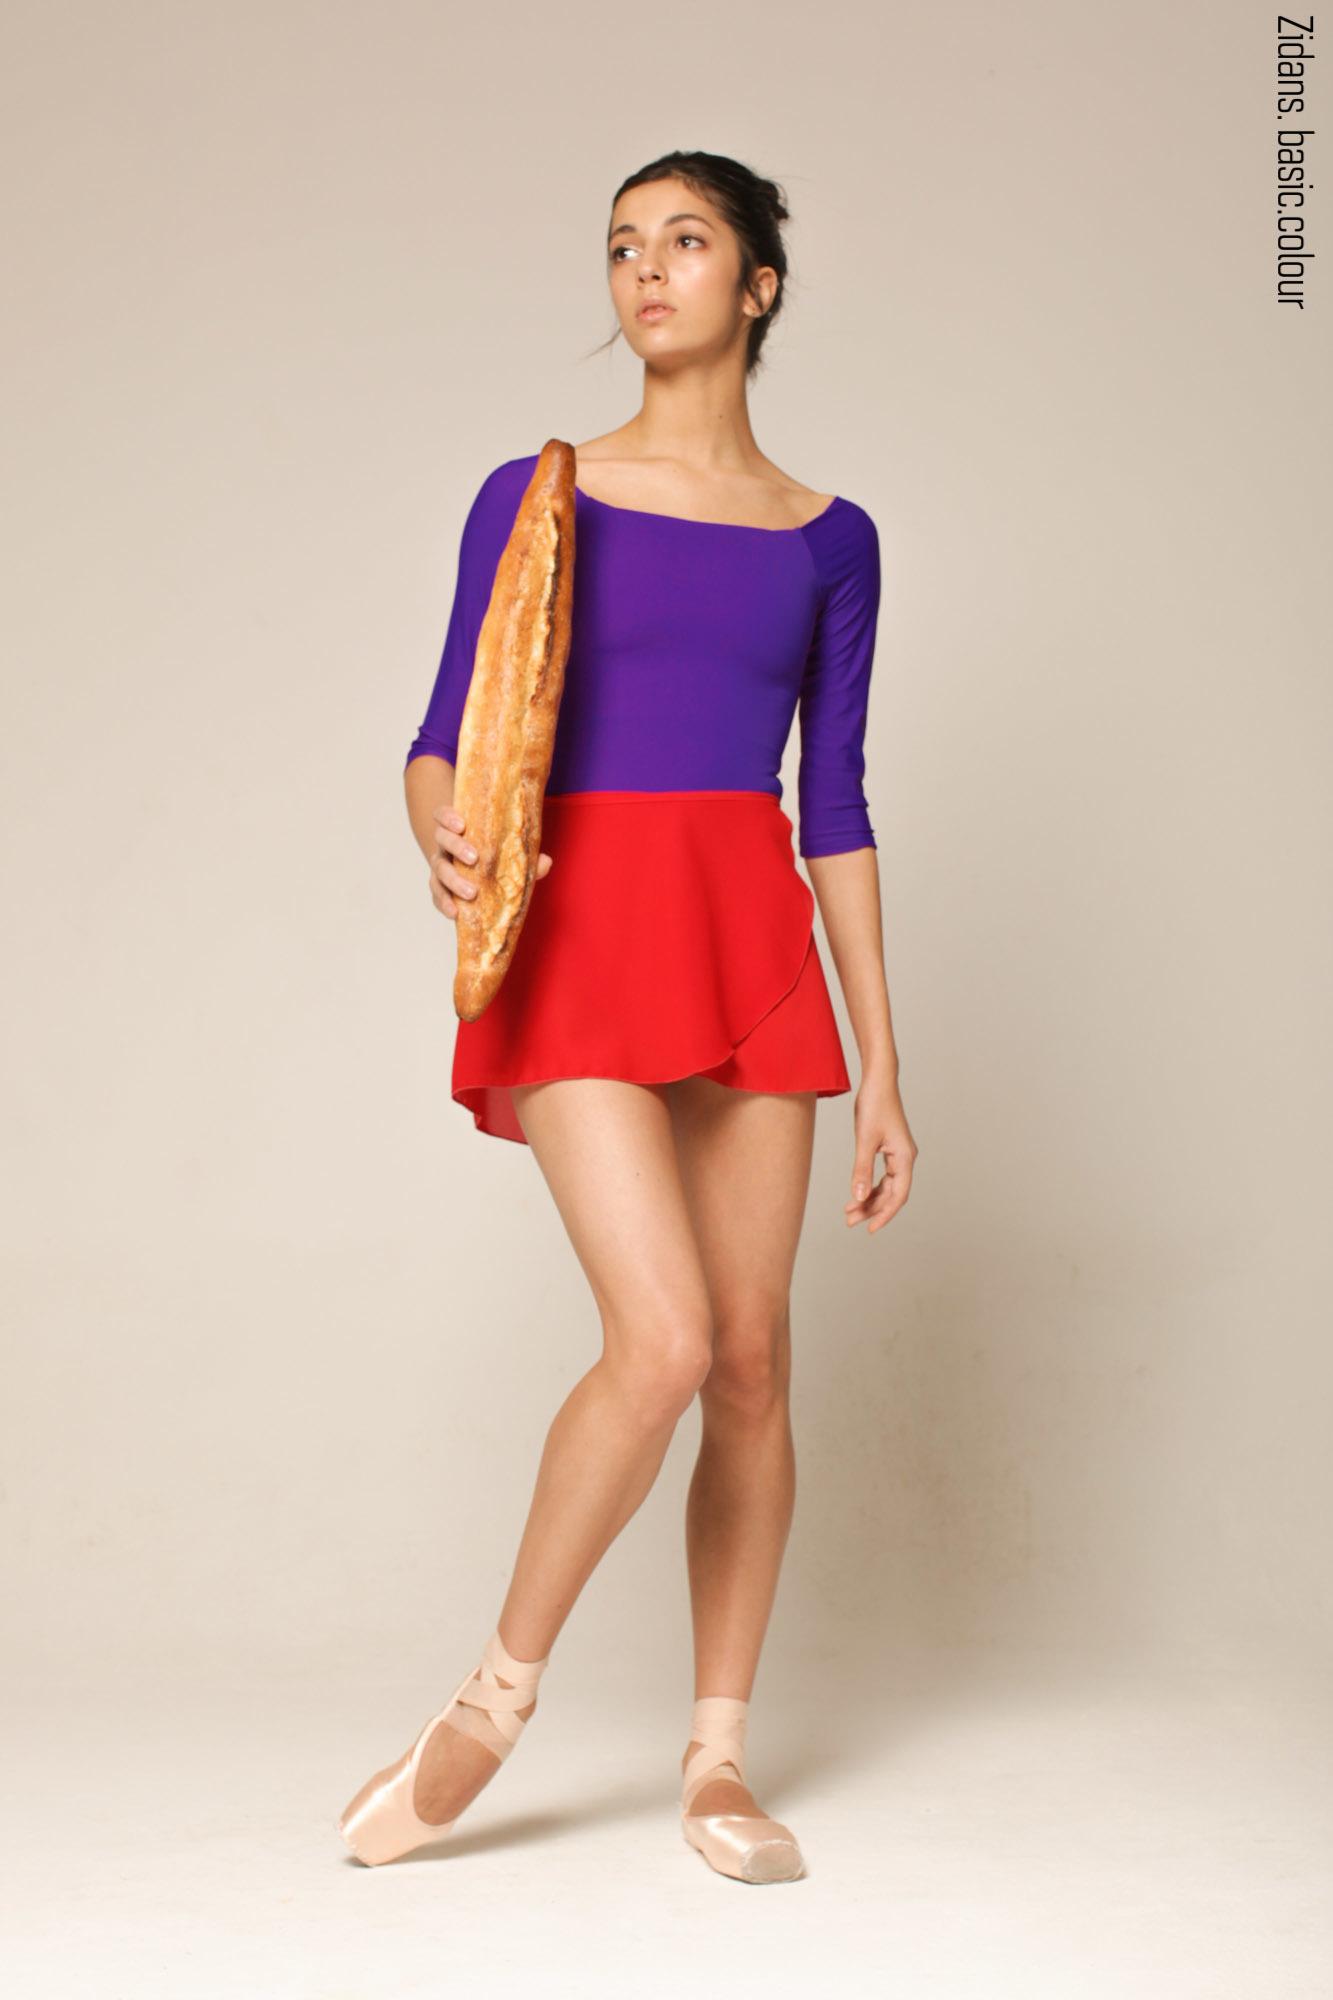 Wrap chiffon skirt 4 lengths | scarlet